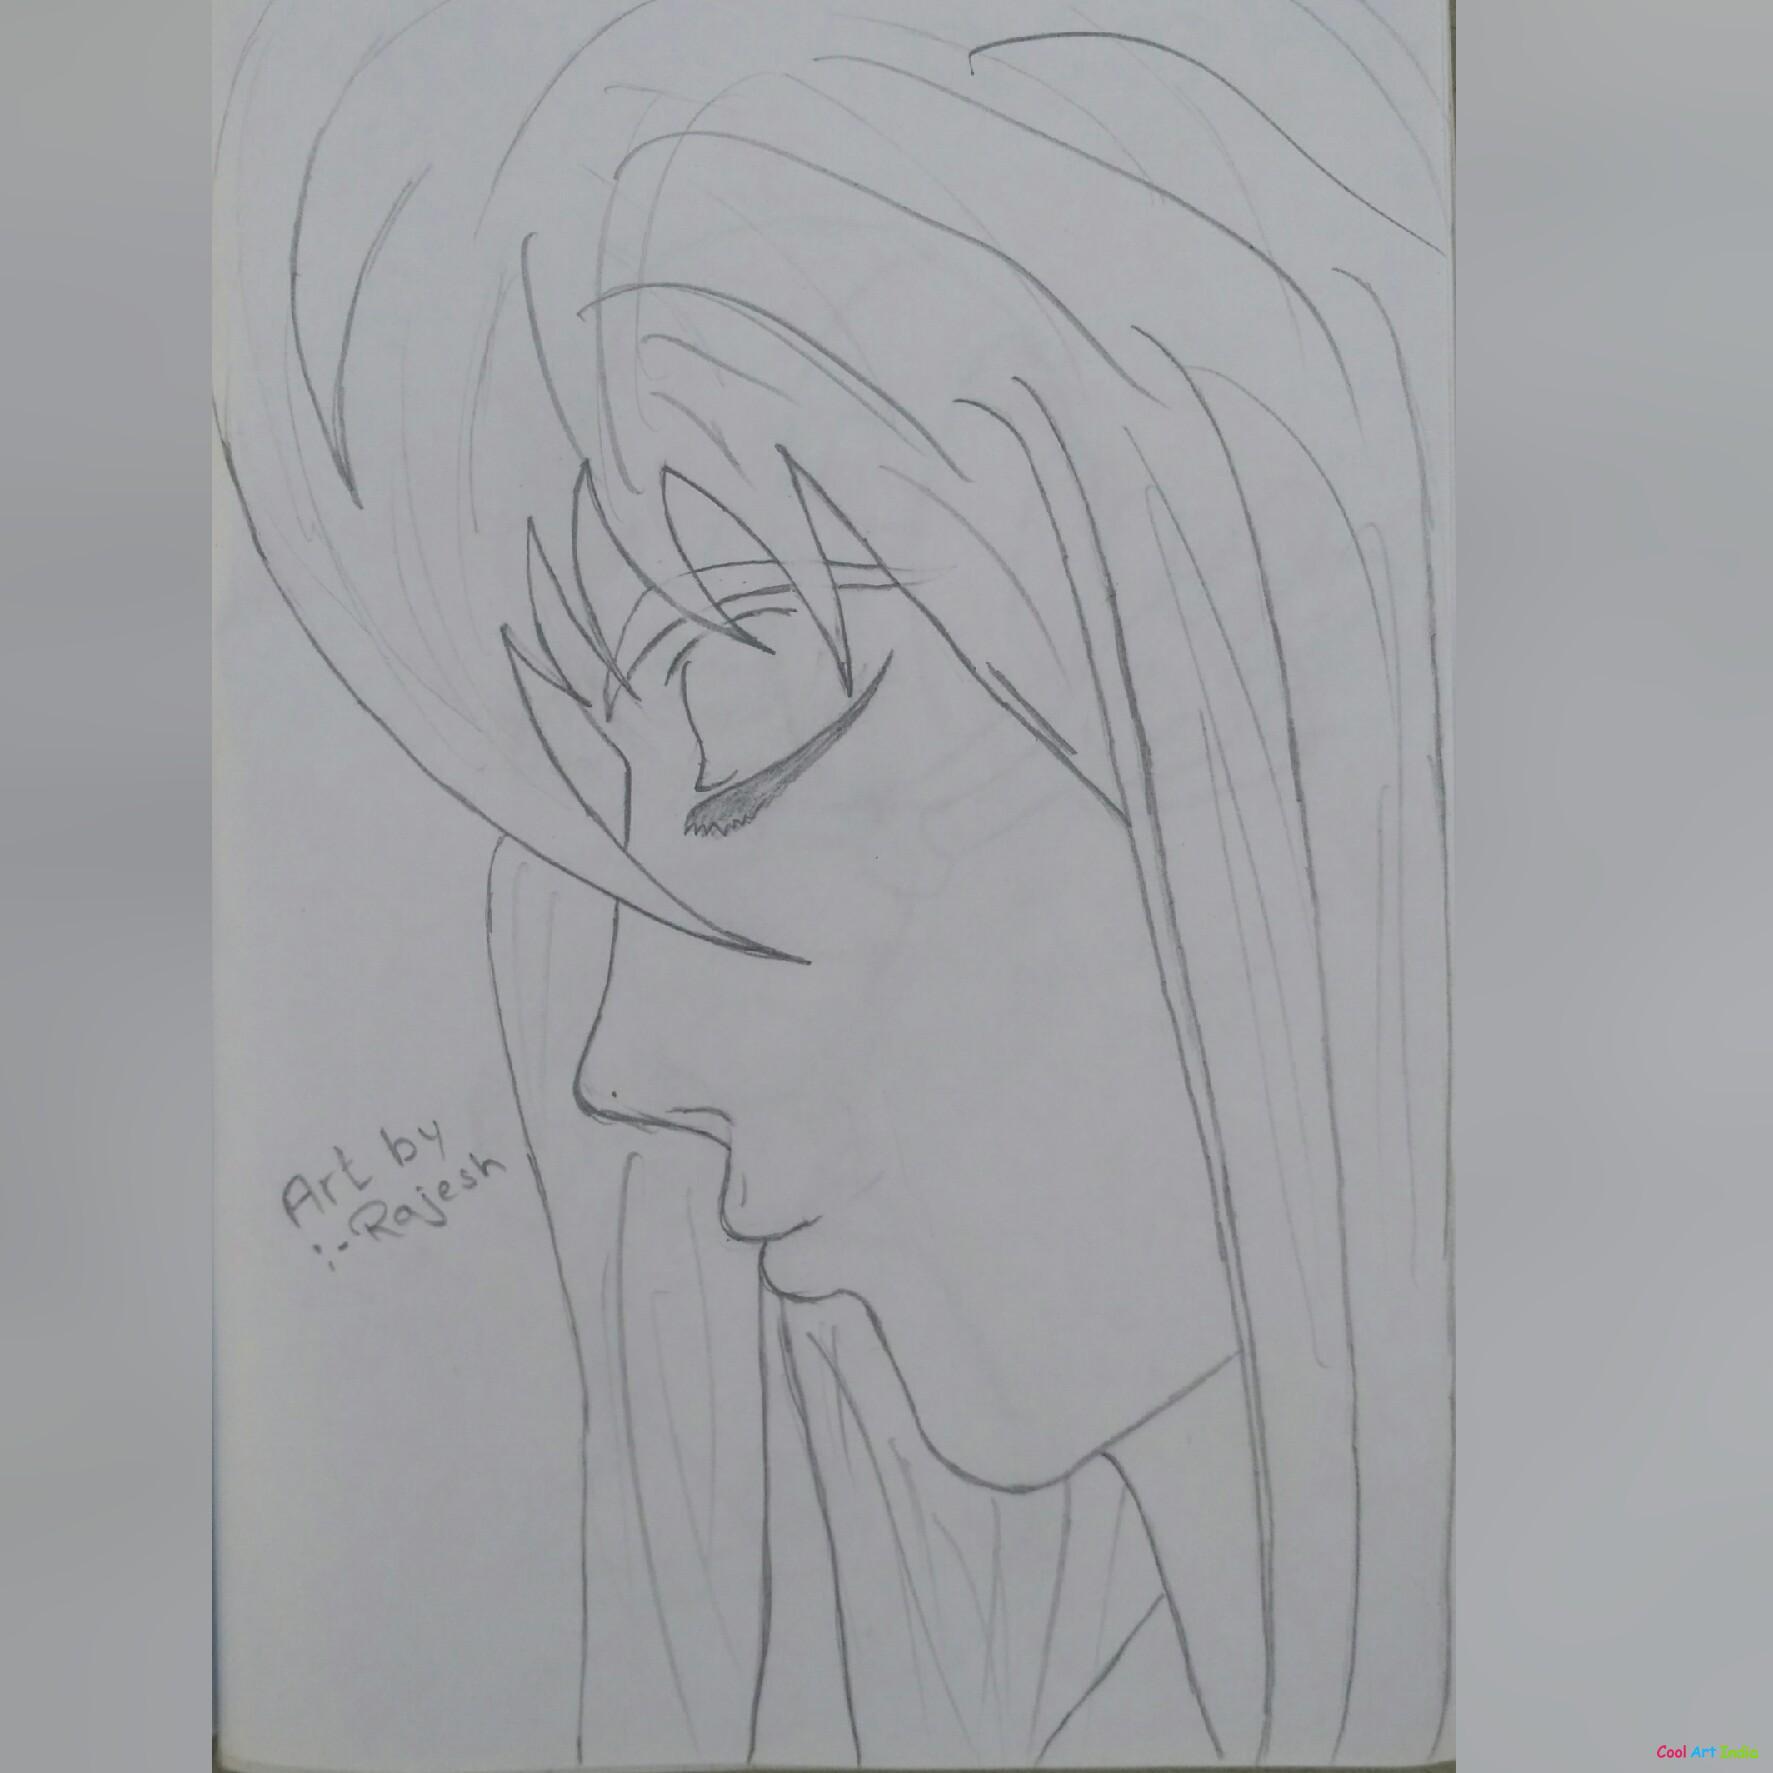 Alone girl by rajesh kumar